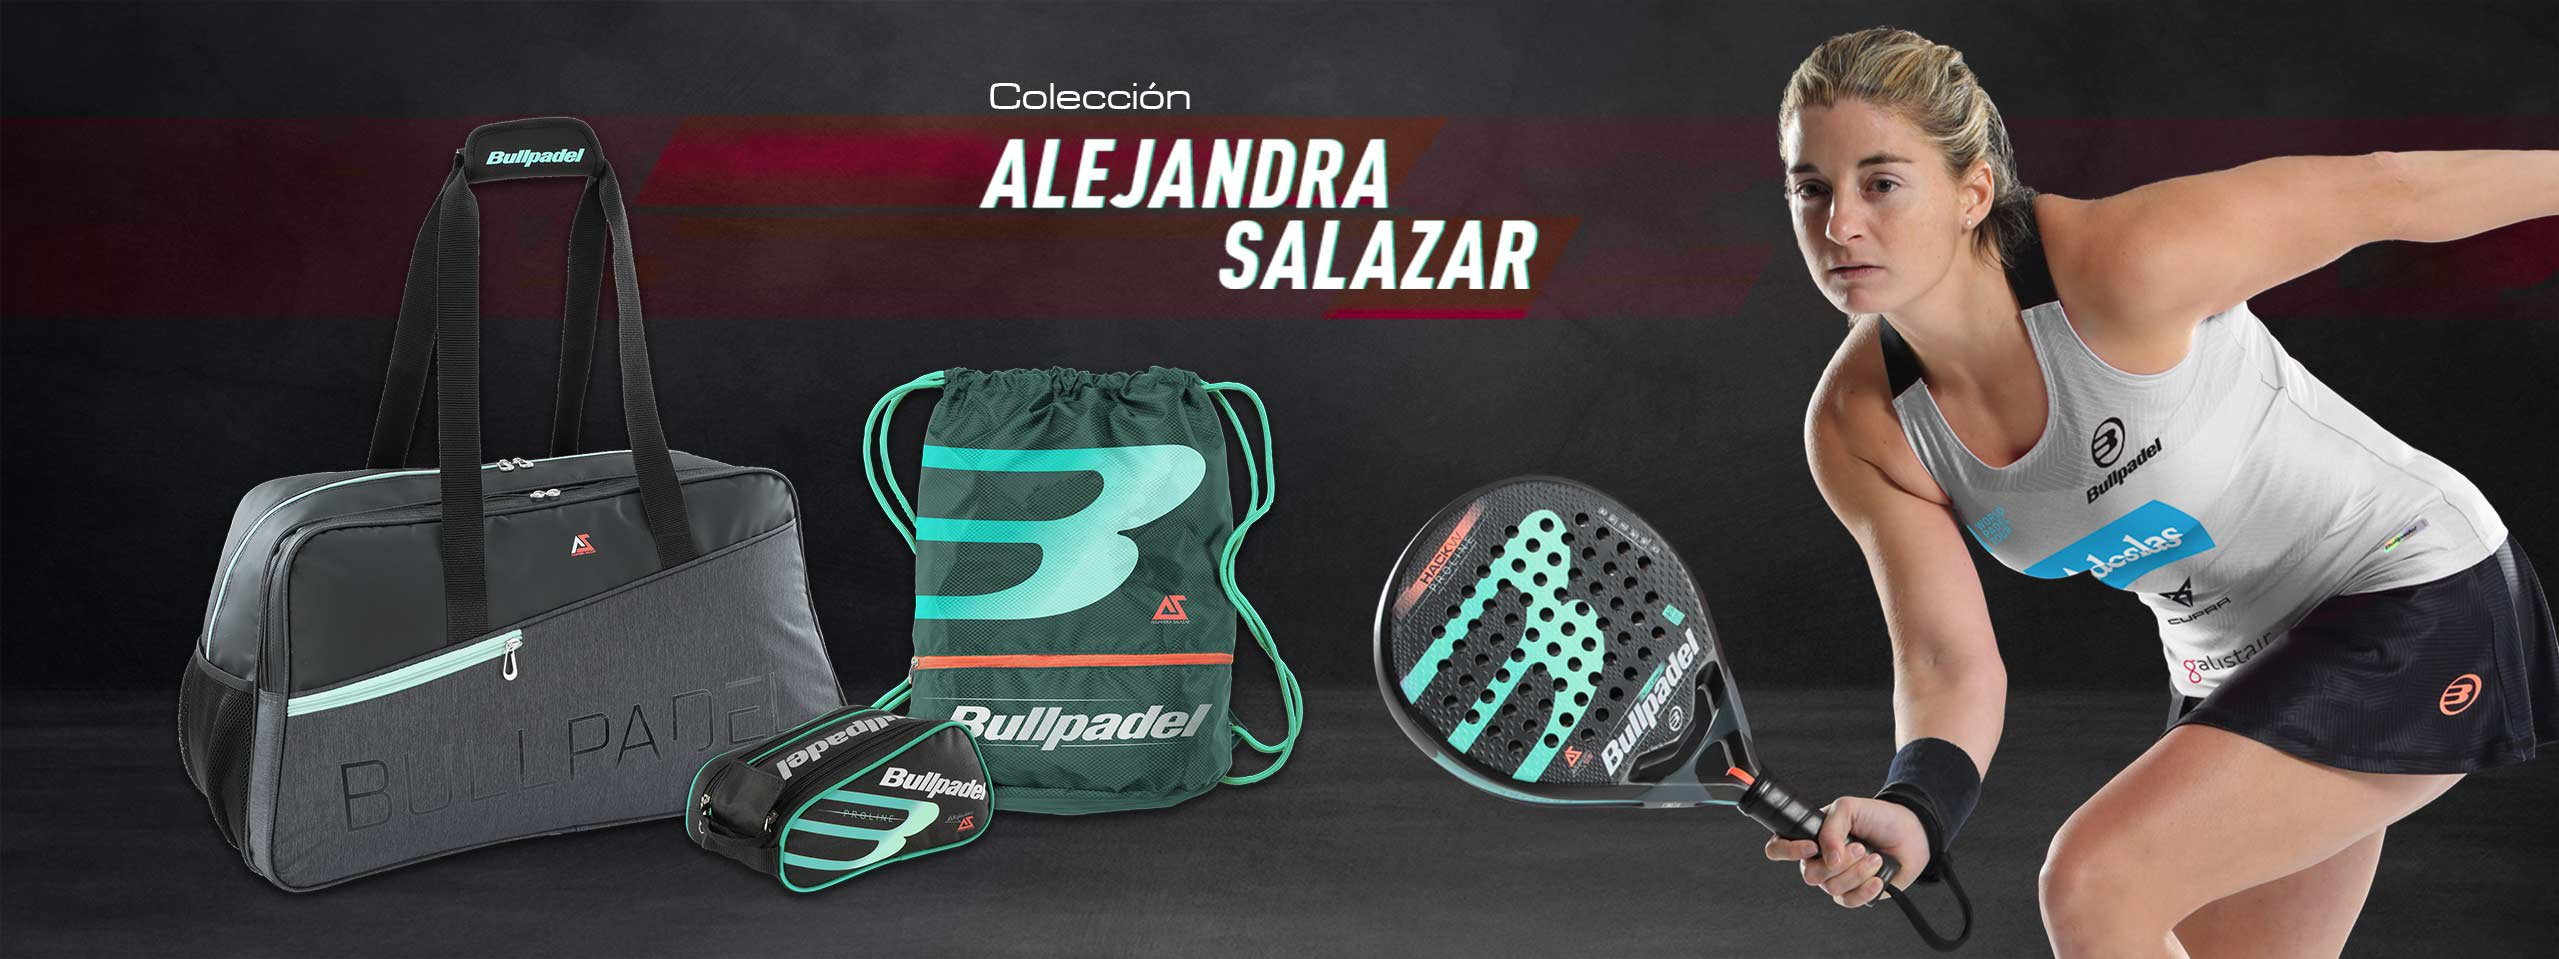 Alejandra Salazar Collection - Bullpadel